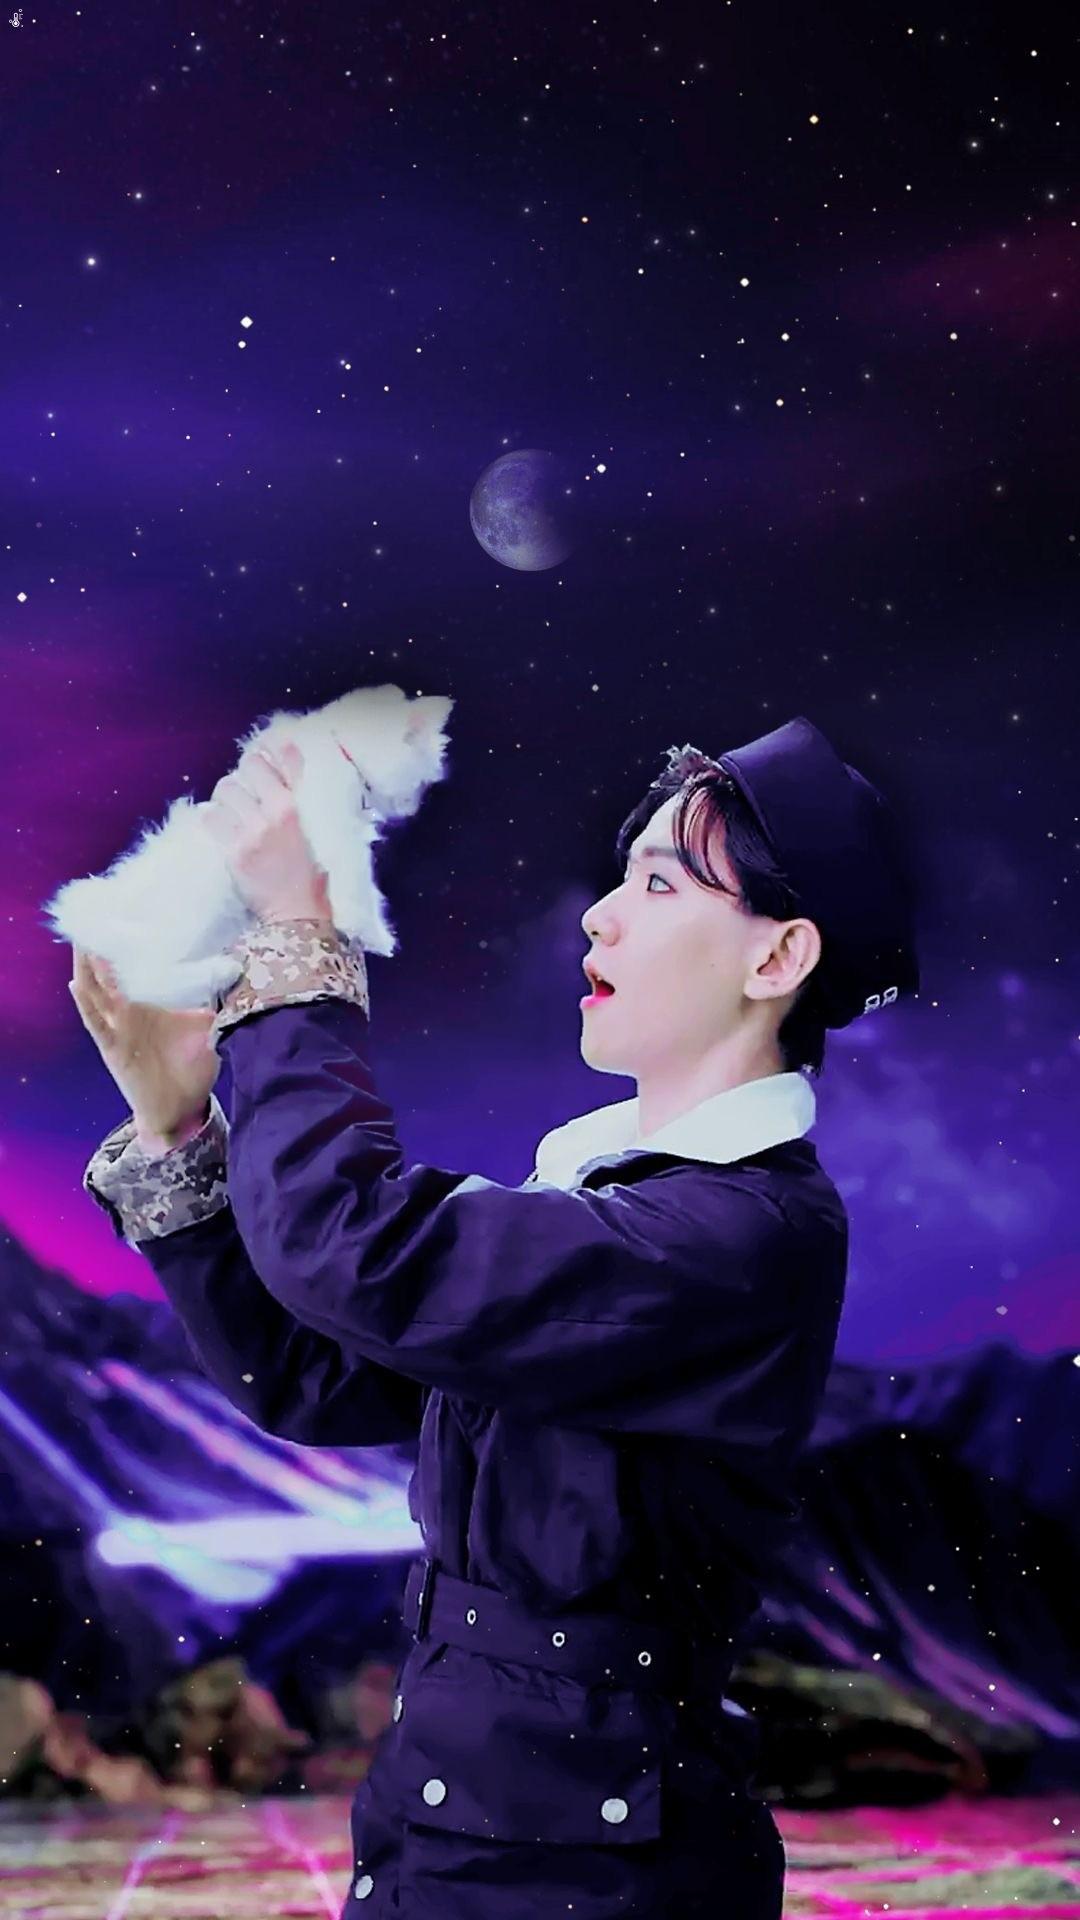 Exo Chanyeol Cute Wallpaper Best 25 Baekhyun Wallpaper Ideas On